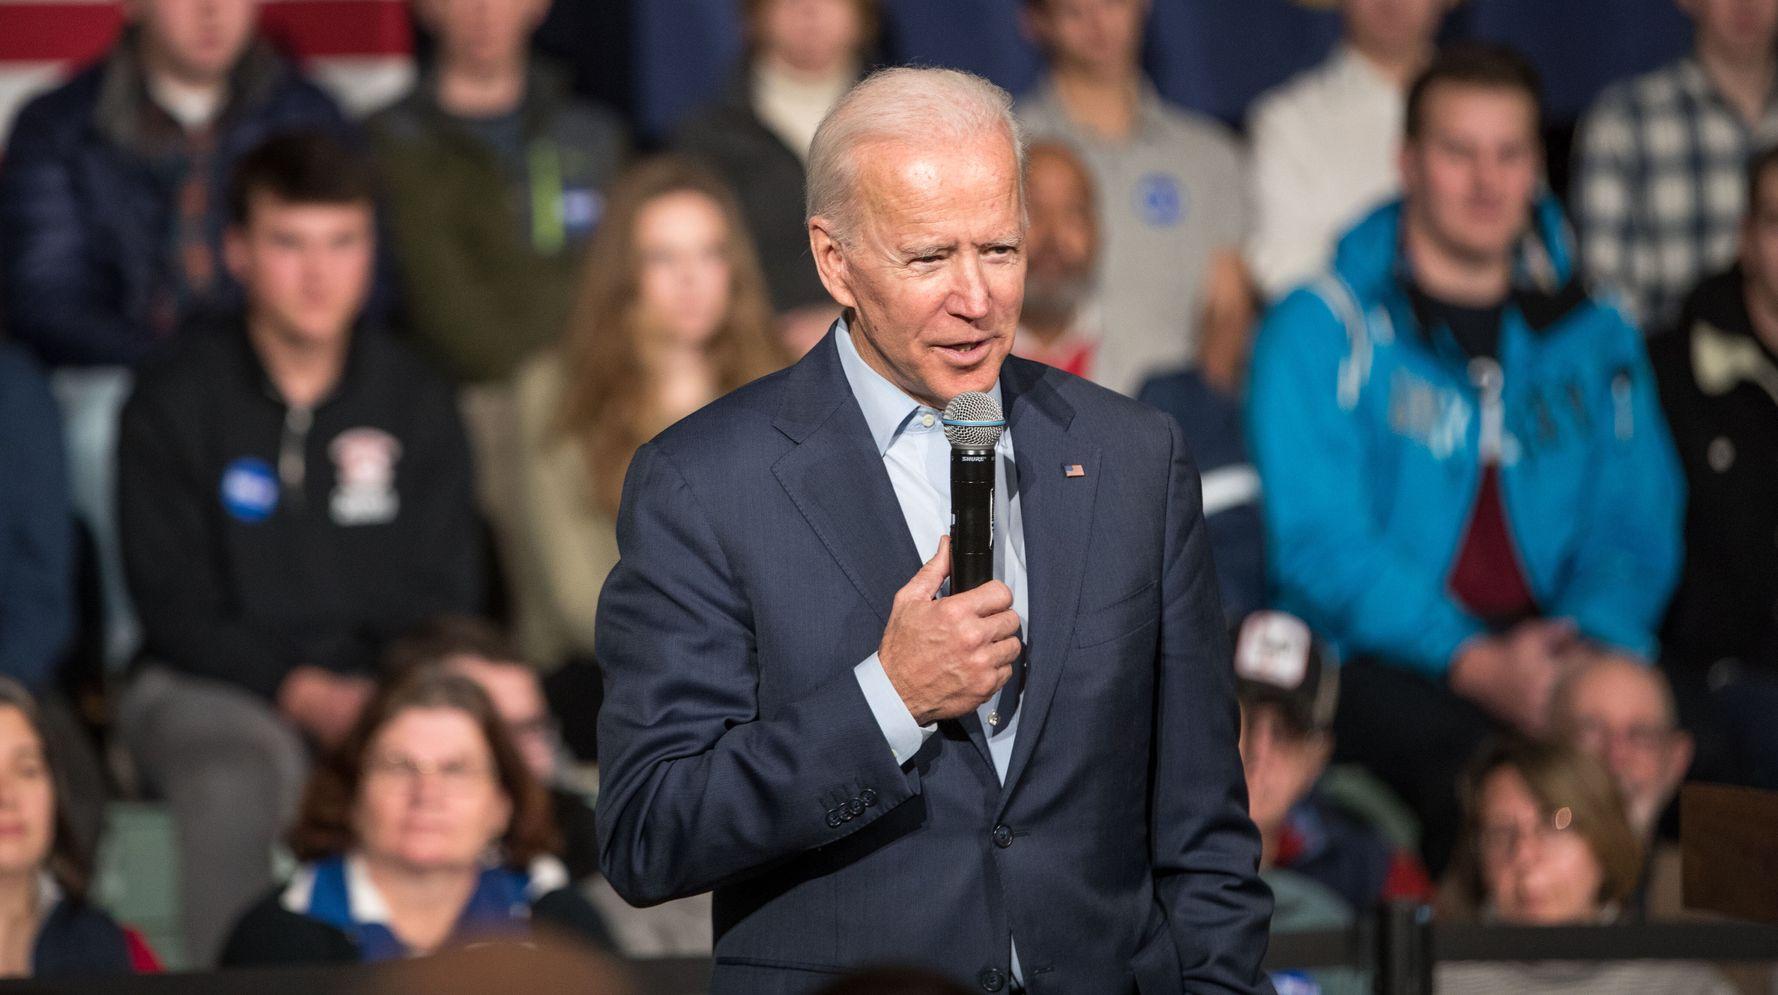 Westlake Legal Group 5e0a68a1240000c31c5a494e Joe Biden Says He's Open To A Republican Running Mate